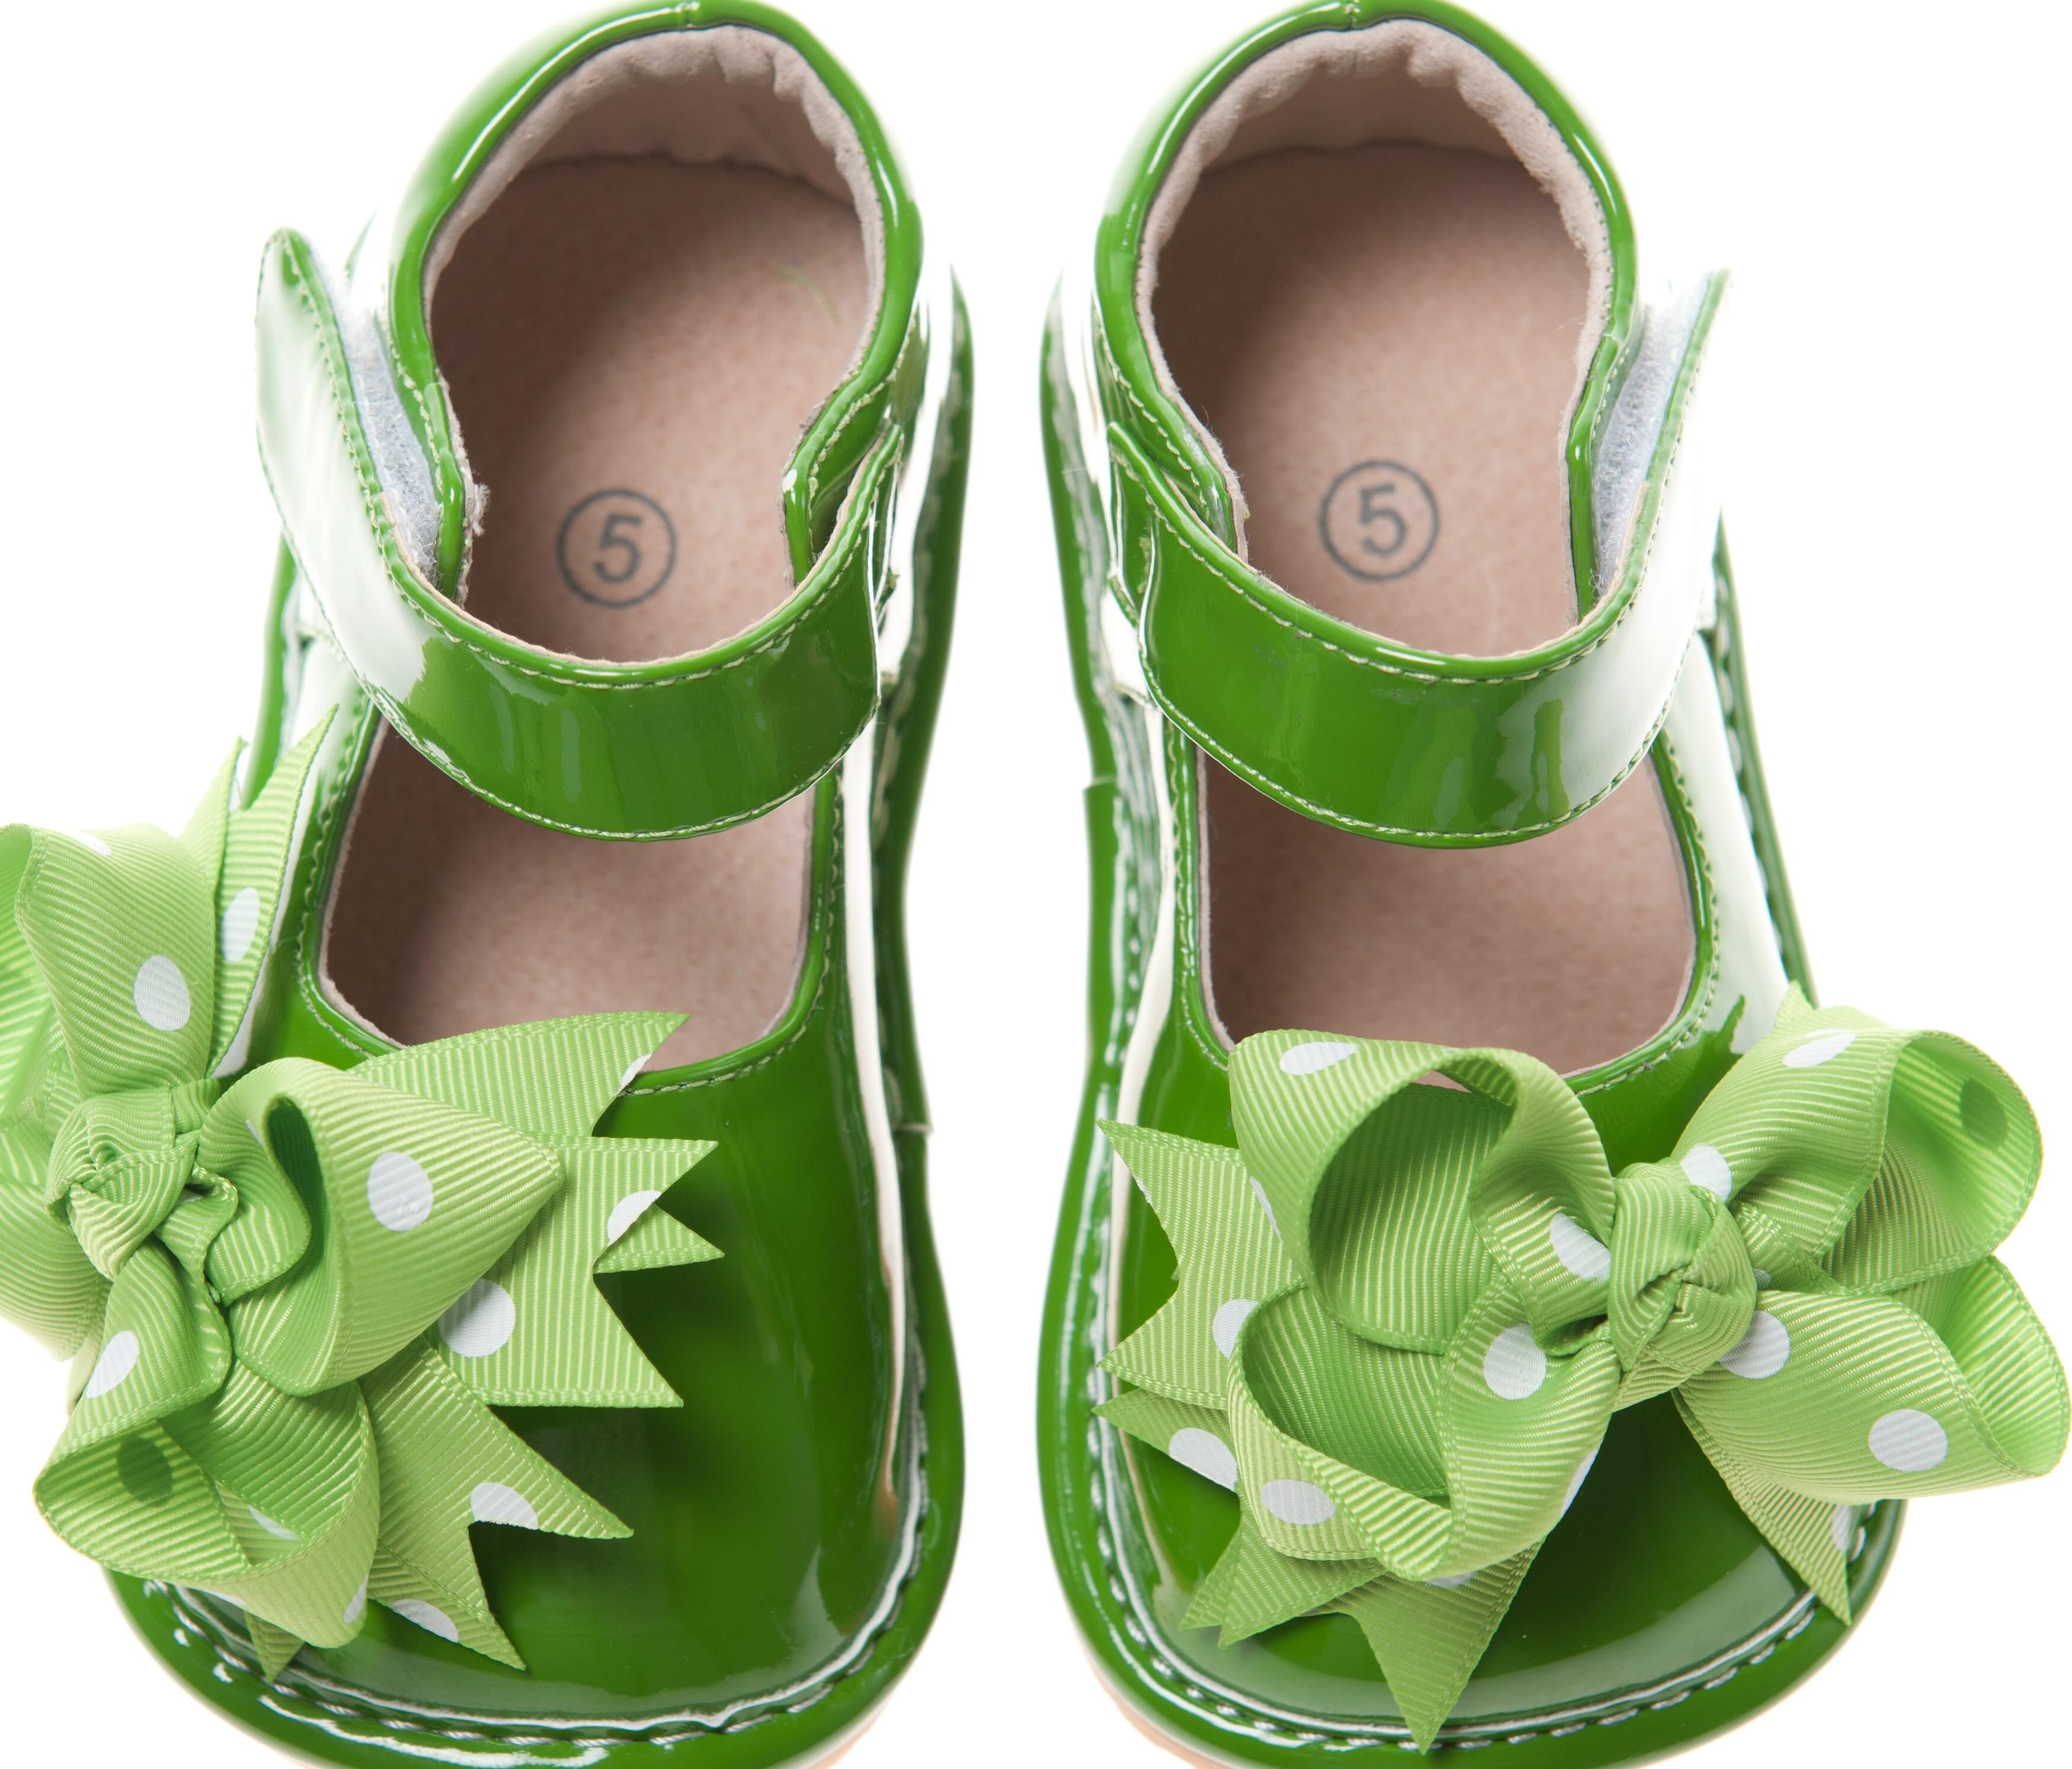 YochiYochi Frog Prince Kairu Squeaky Shoes YochiYochi $29 95